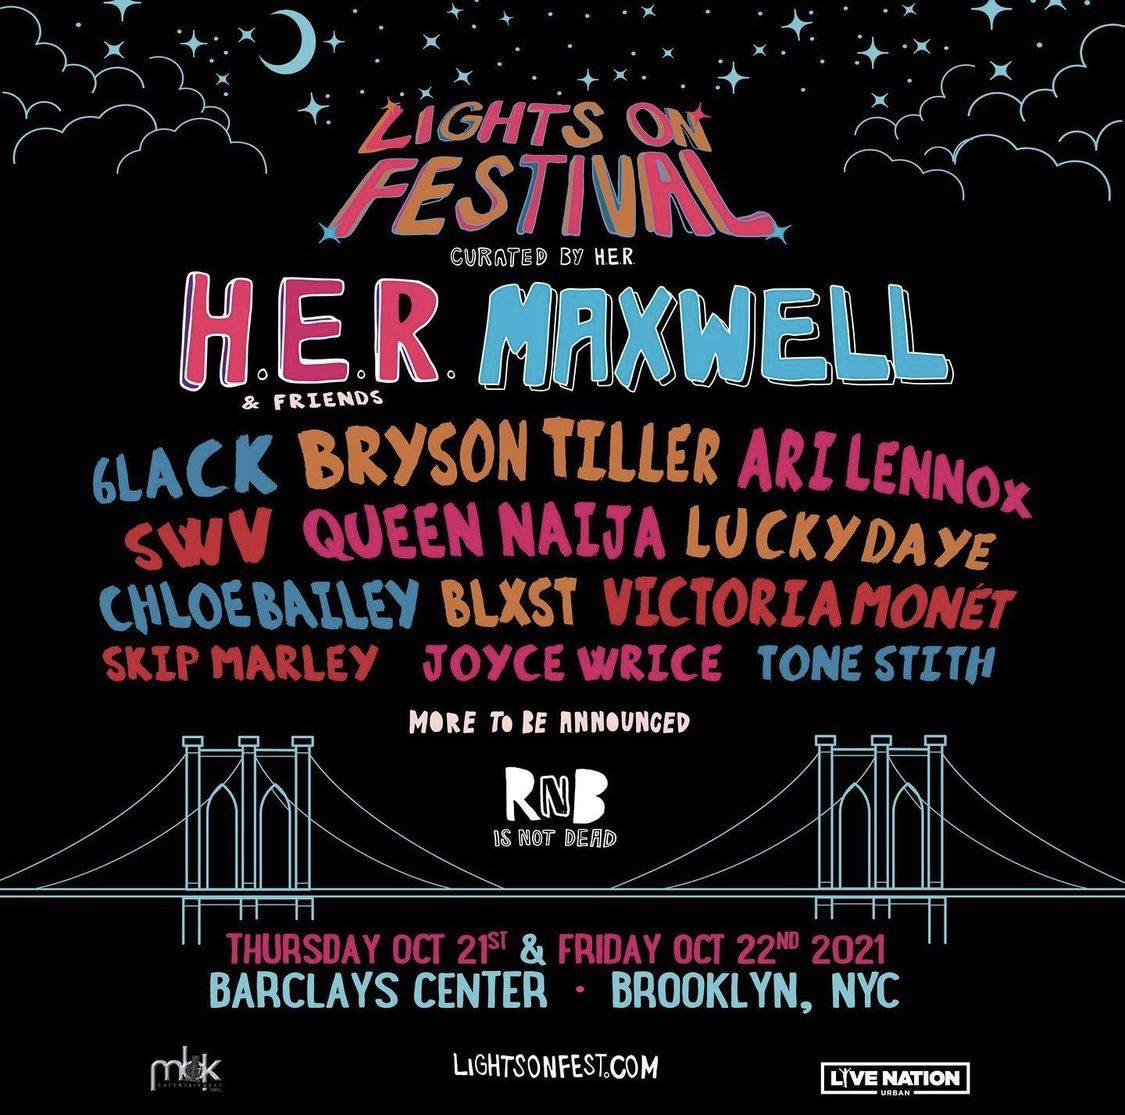 Lights On Festival